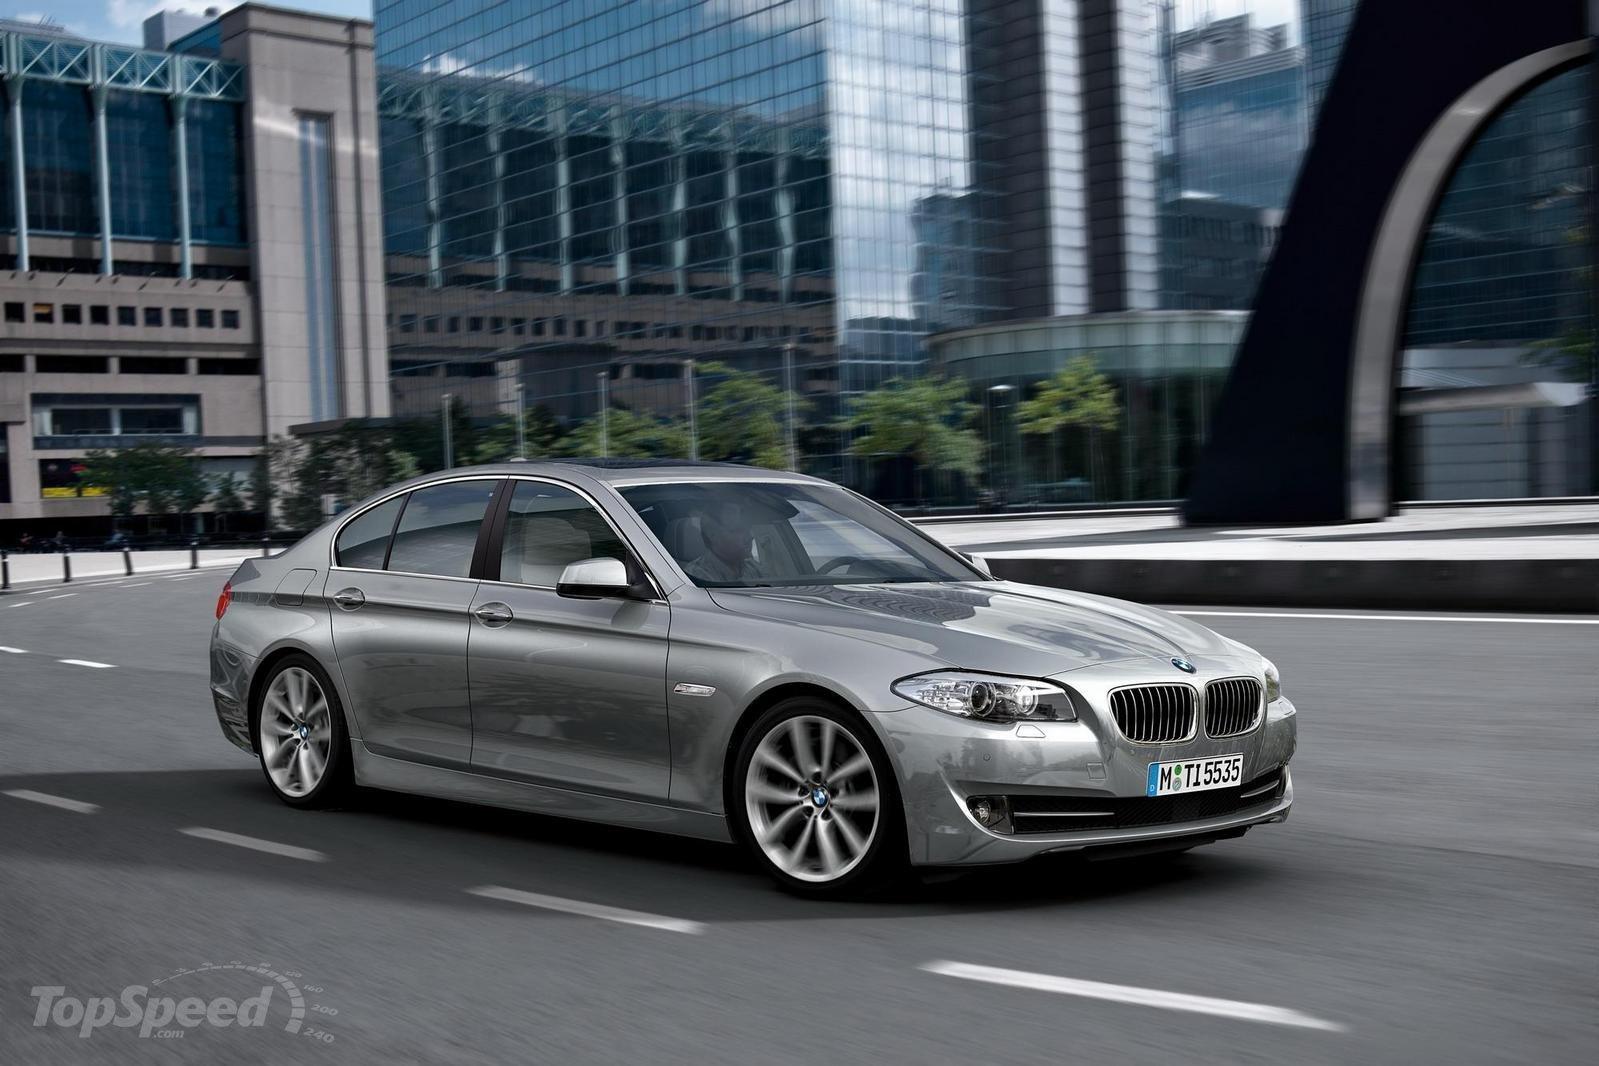 2011 BMW 5 Series Sedanto debut at the New York Auto Show